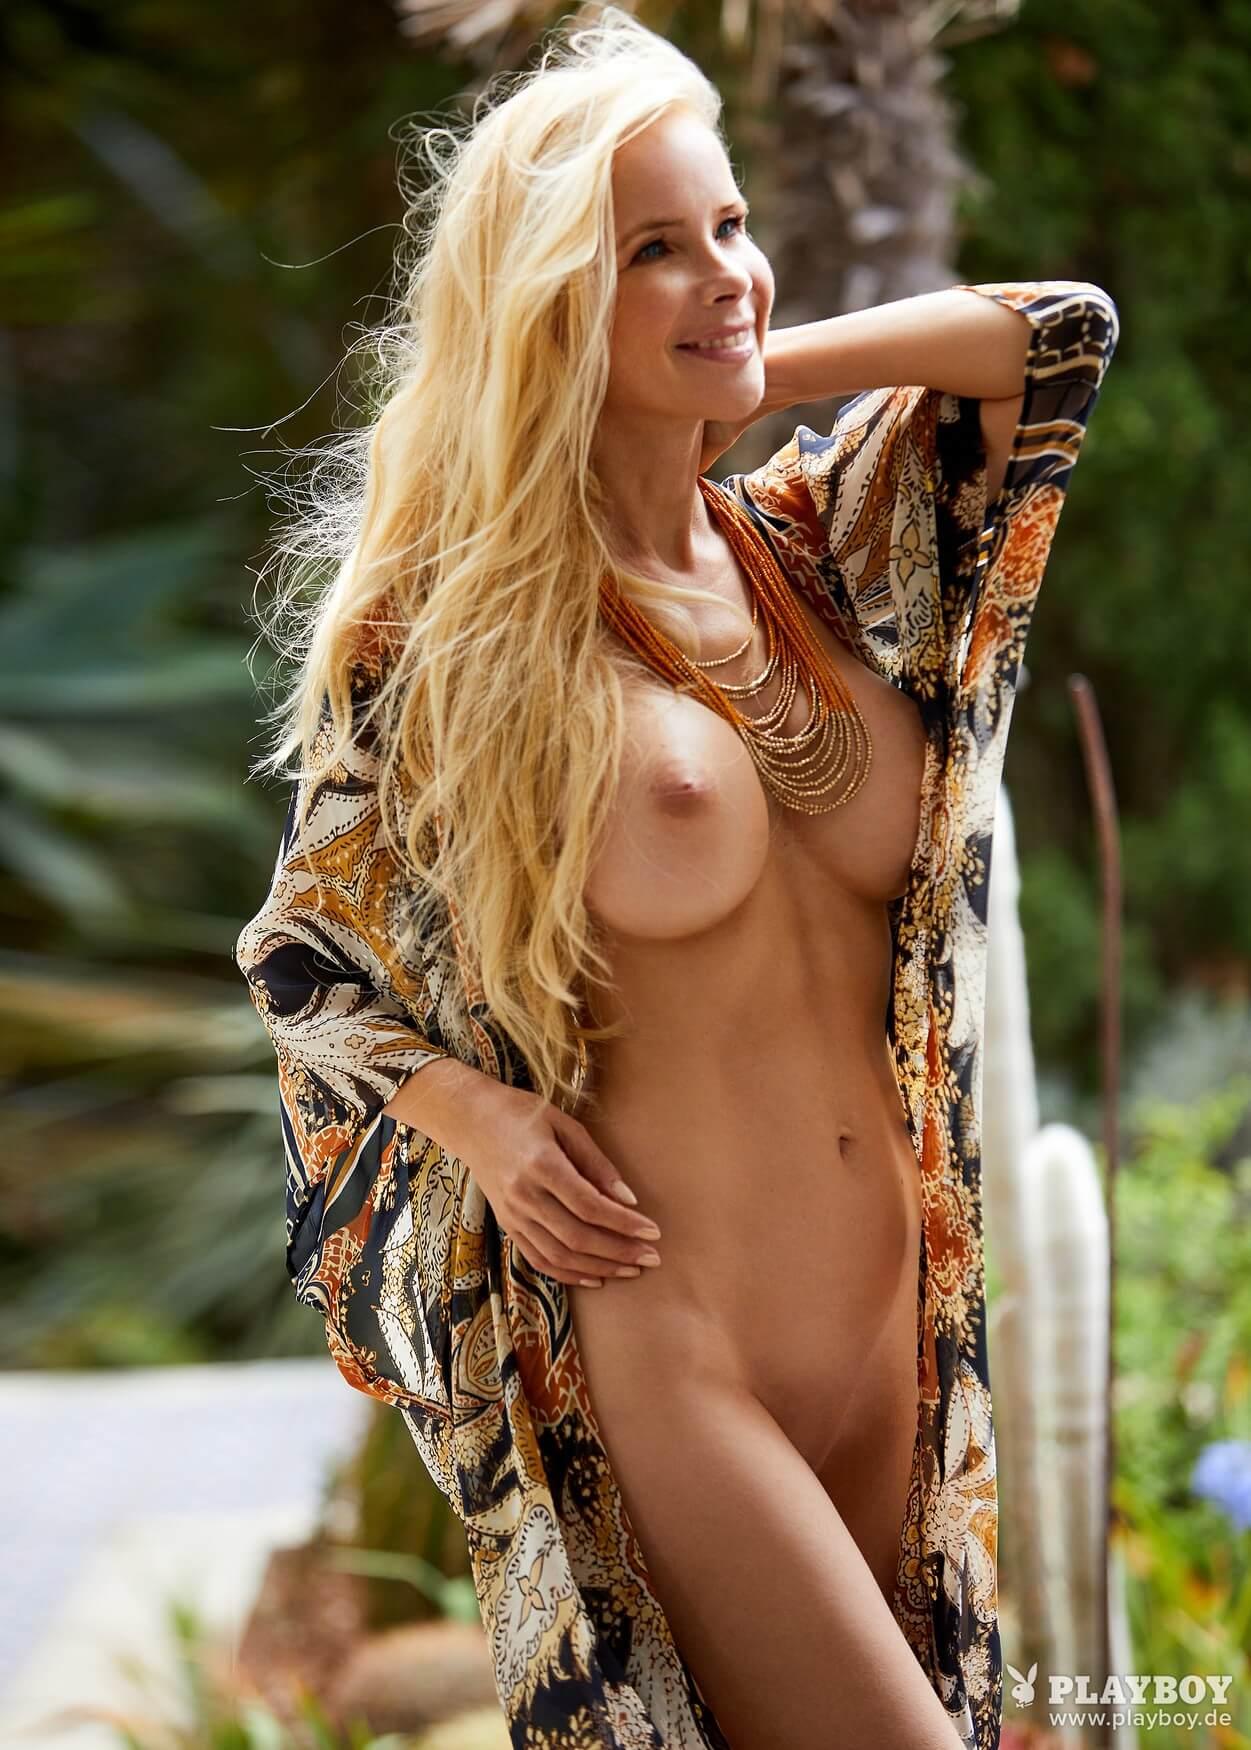 Playboy De - Sylvia Leifheit Coverstar September 2019 10 -9897